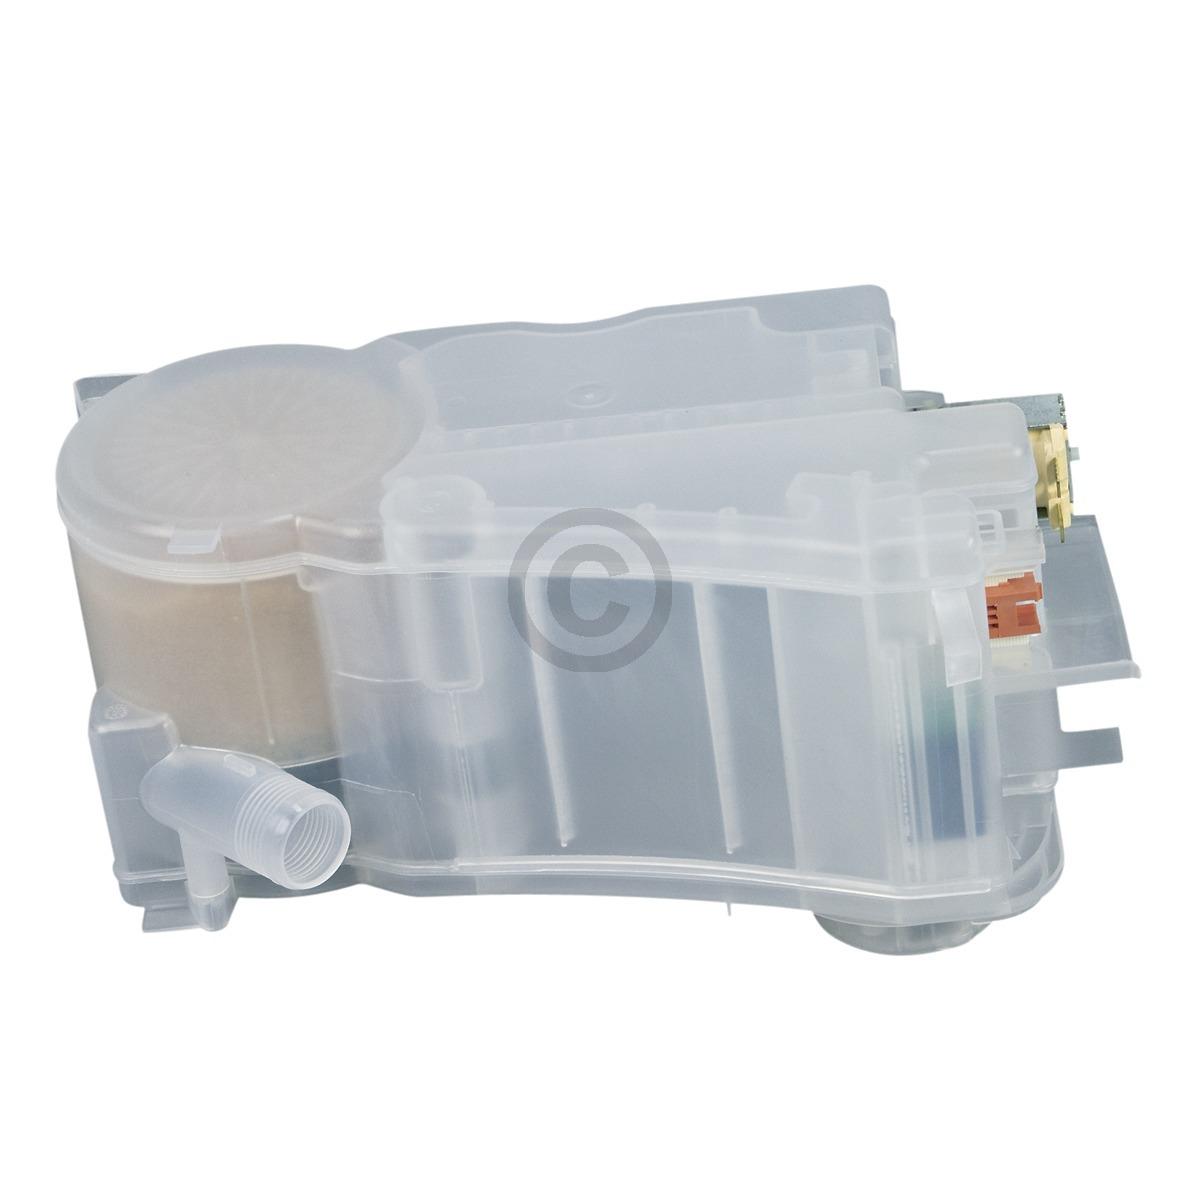 Salzbehälter AEG 117484900/8 für Geschirrspüler AEG, Electrolux, Juno, Zanussi